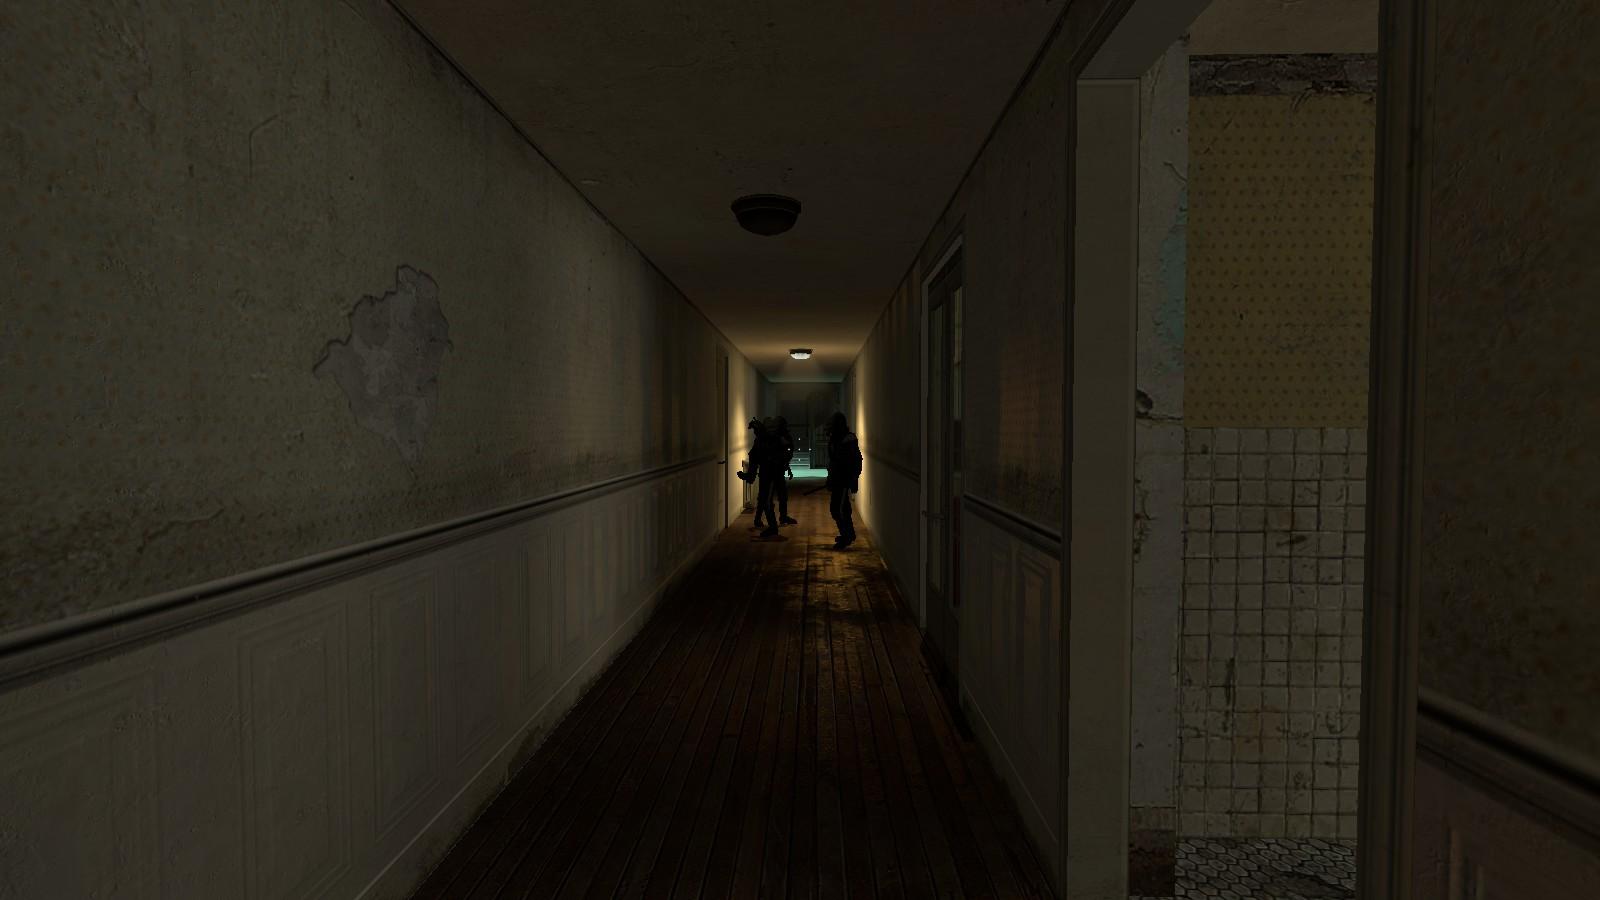 city 17 apt hallway 1